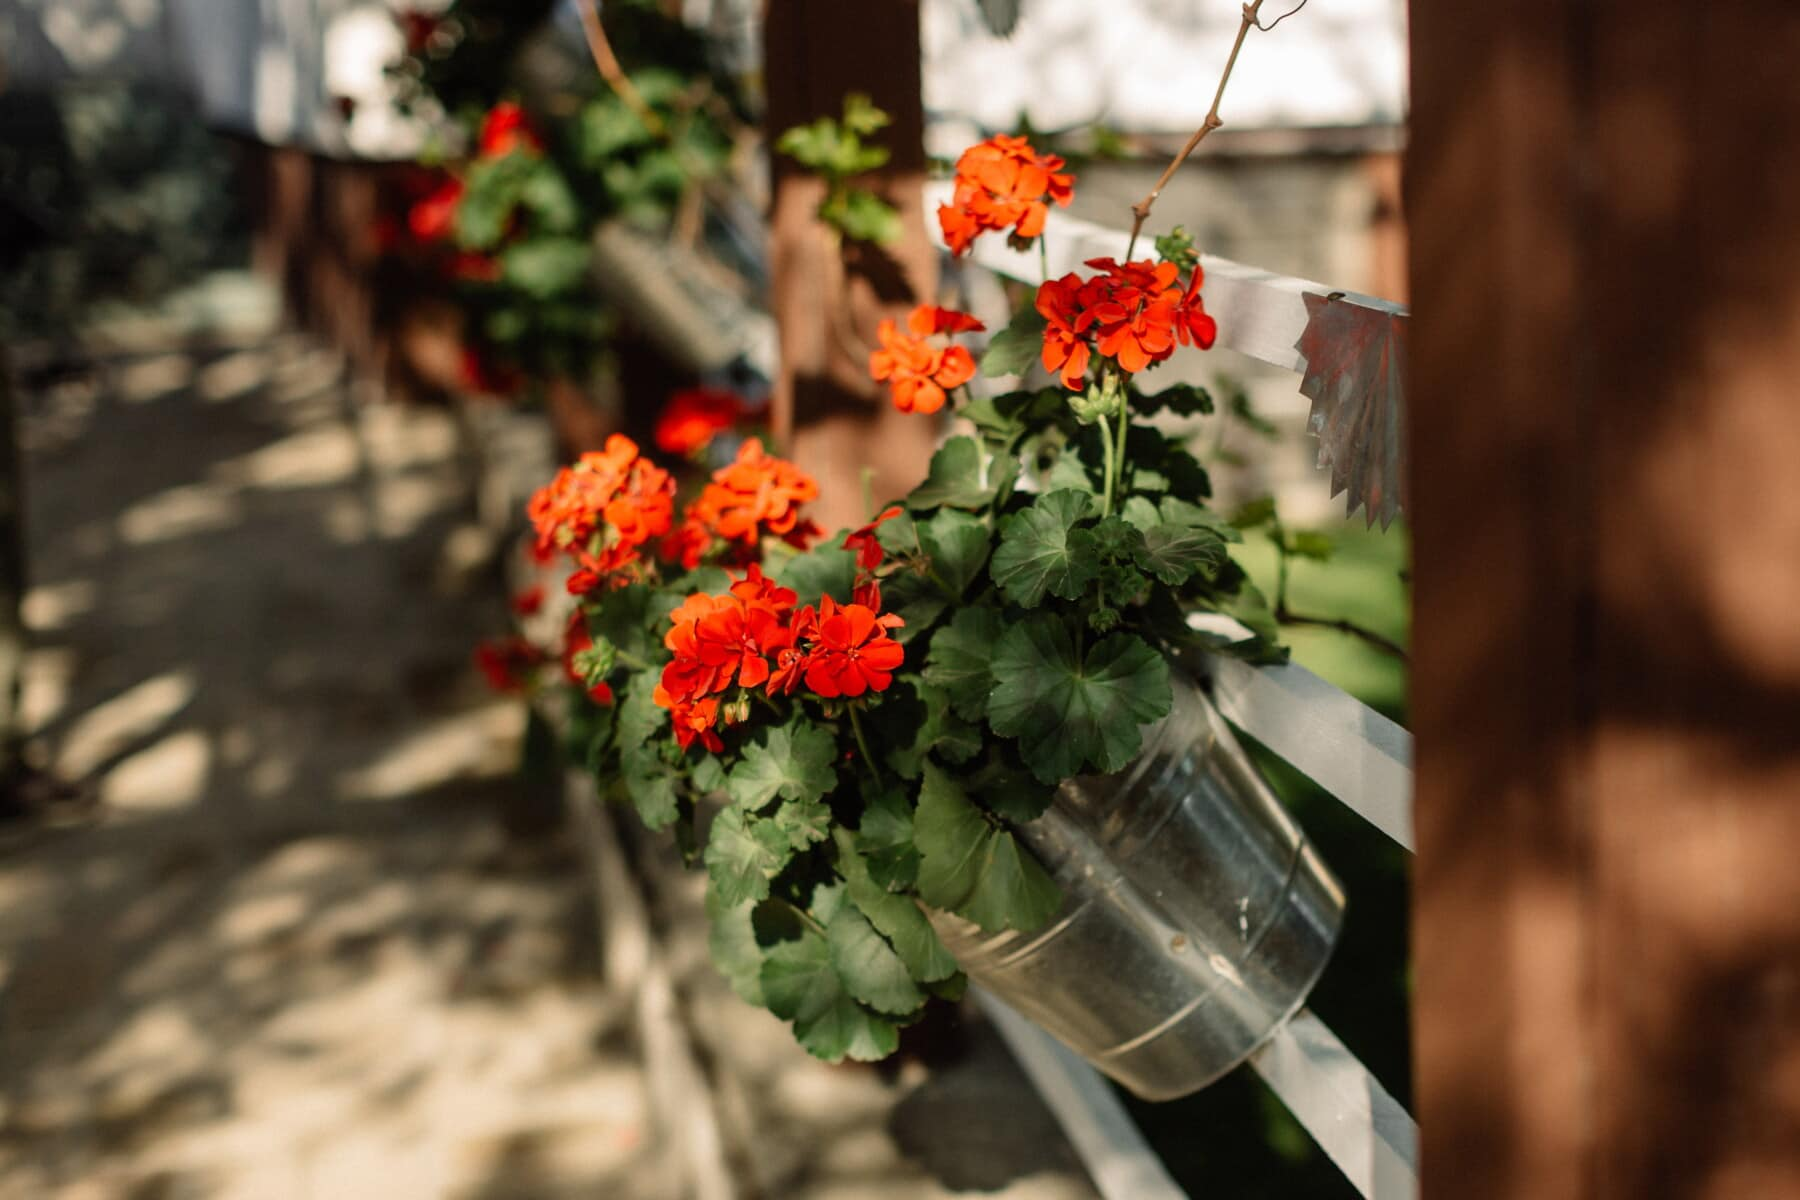 geranium, flowerpot, bucket, metal, vintage, picket fence, flower, plant, nature, leaf